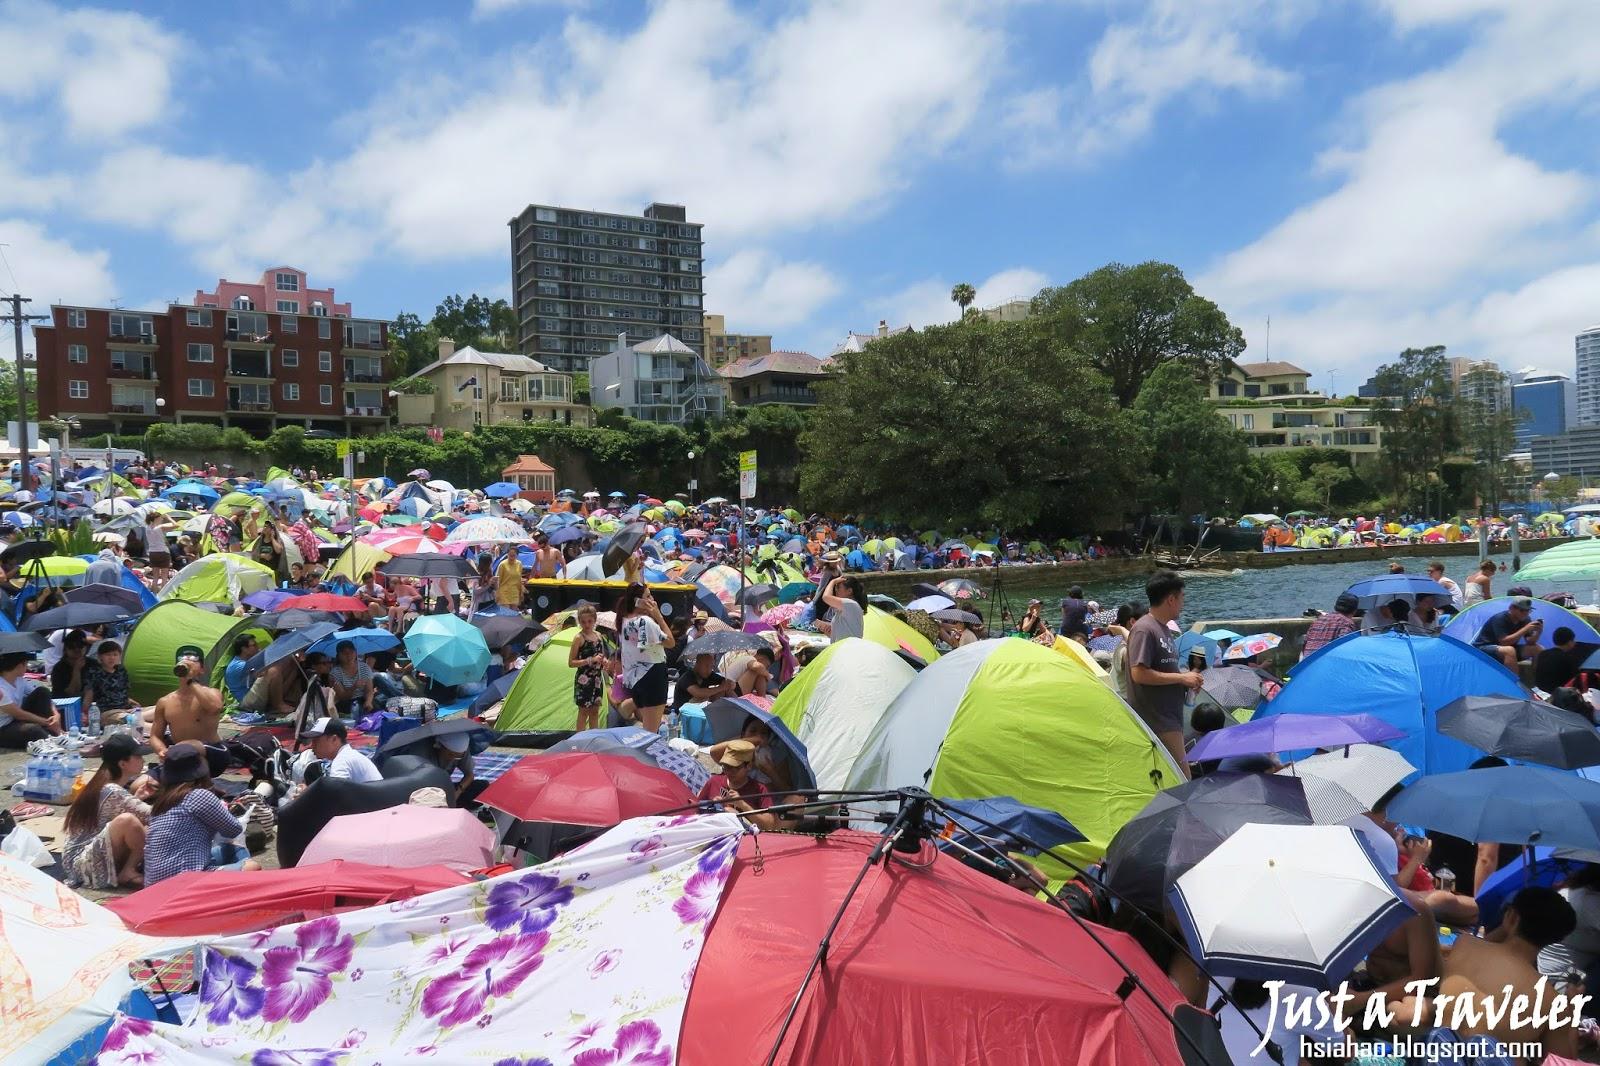 雪梨-跨年-煙火-地點-推薦-旅遊-自由行-澳洲-Sydney-Tourist-Attraction-Travel-Australia